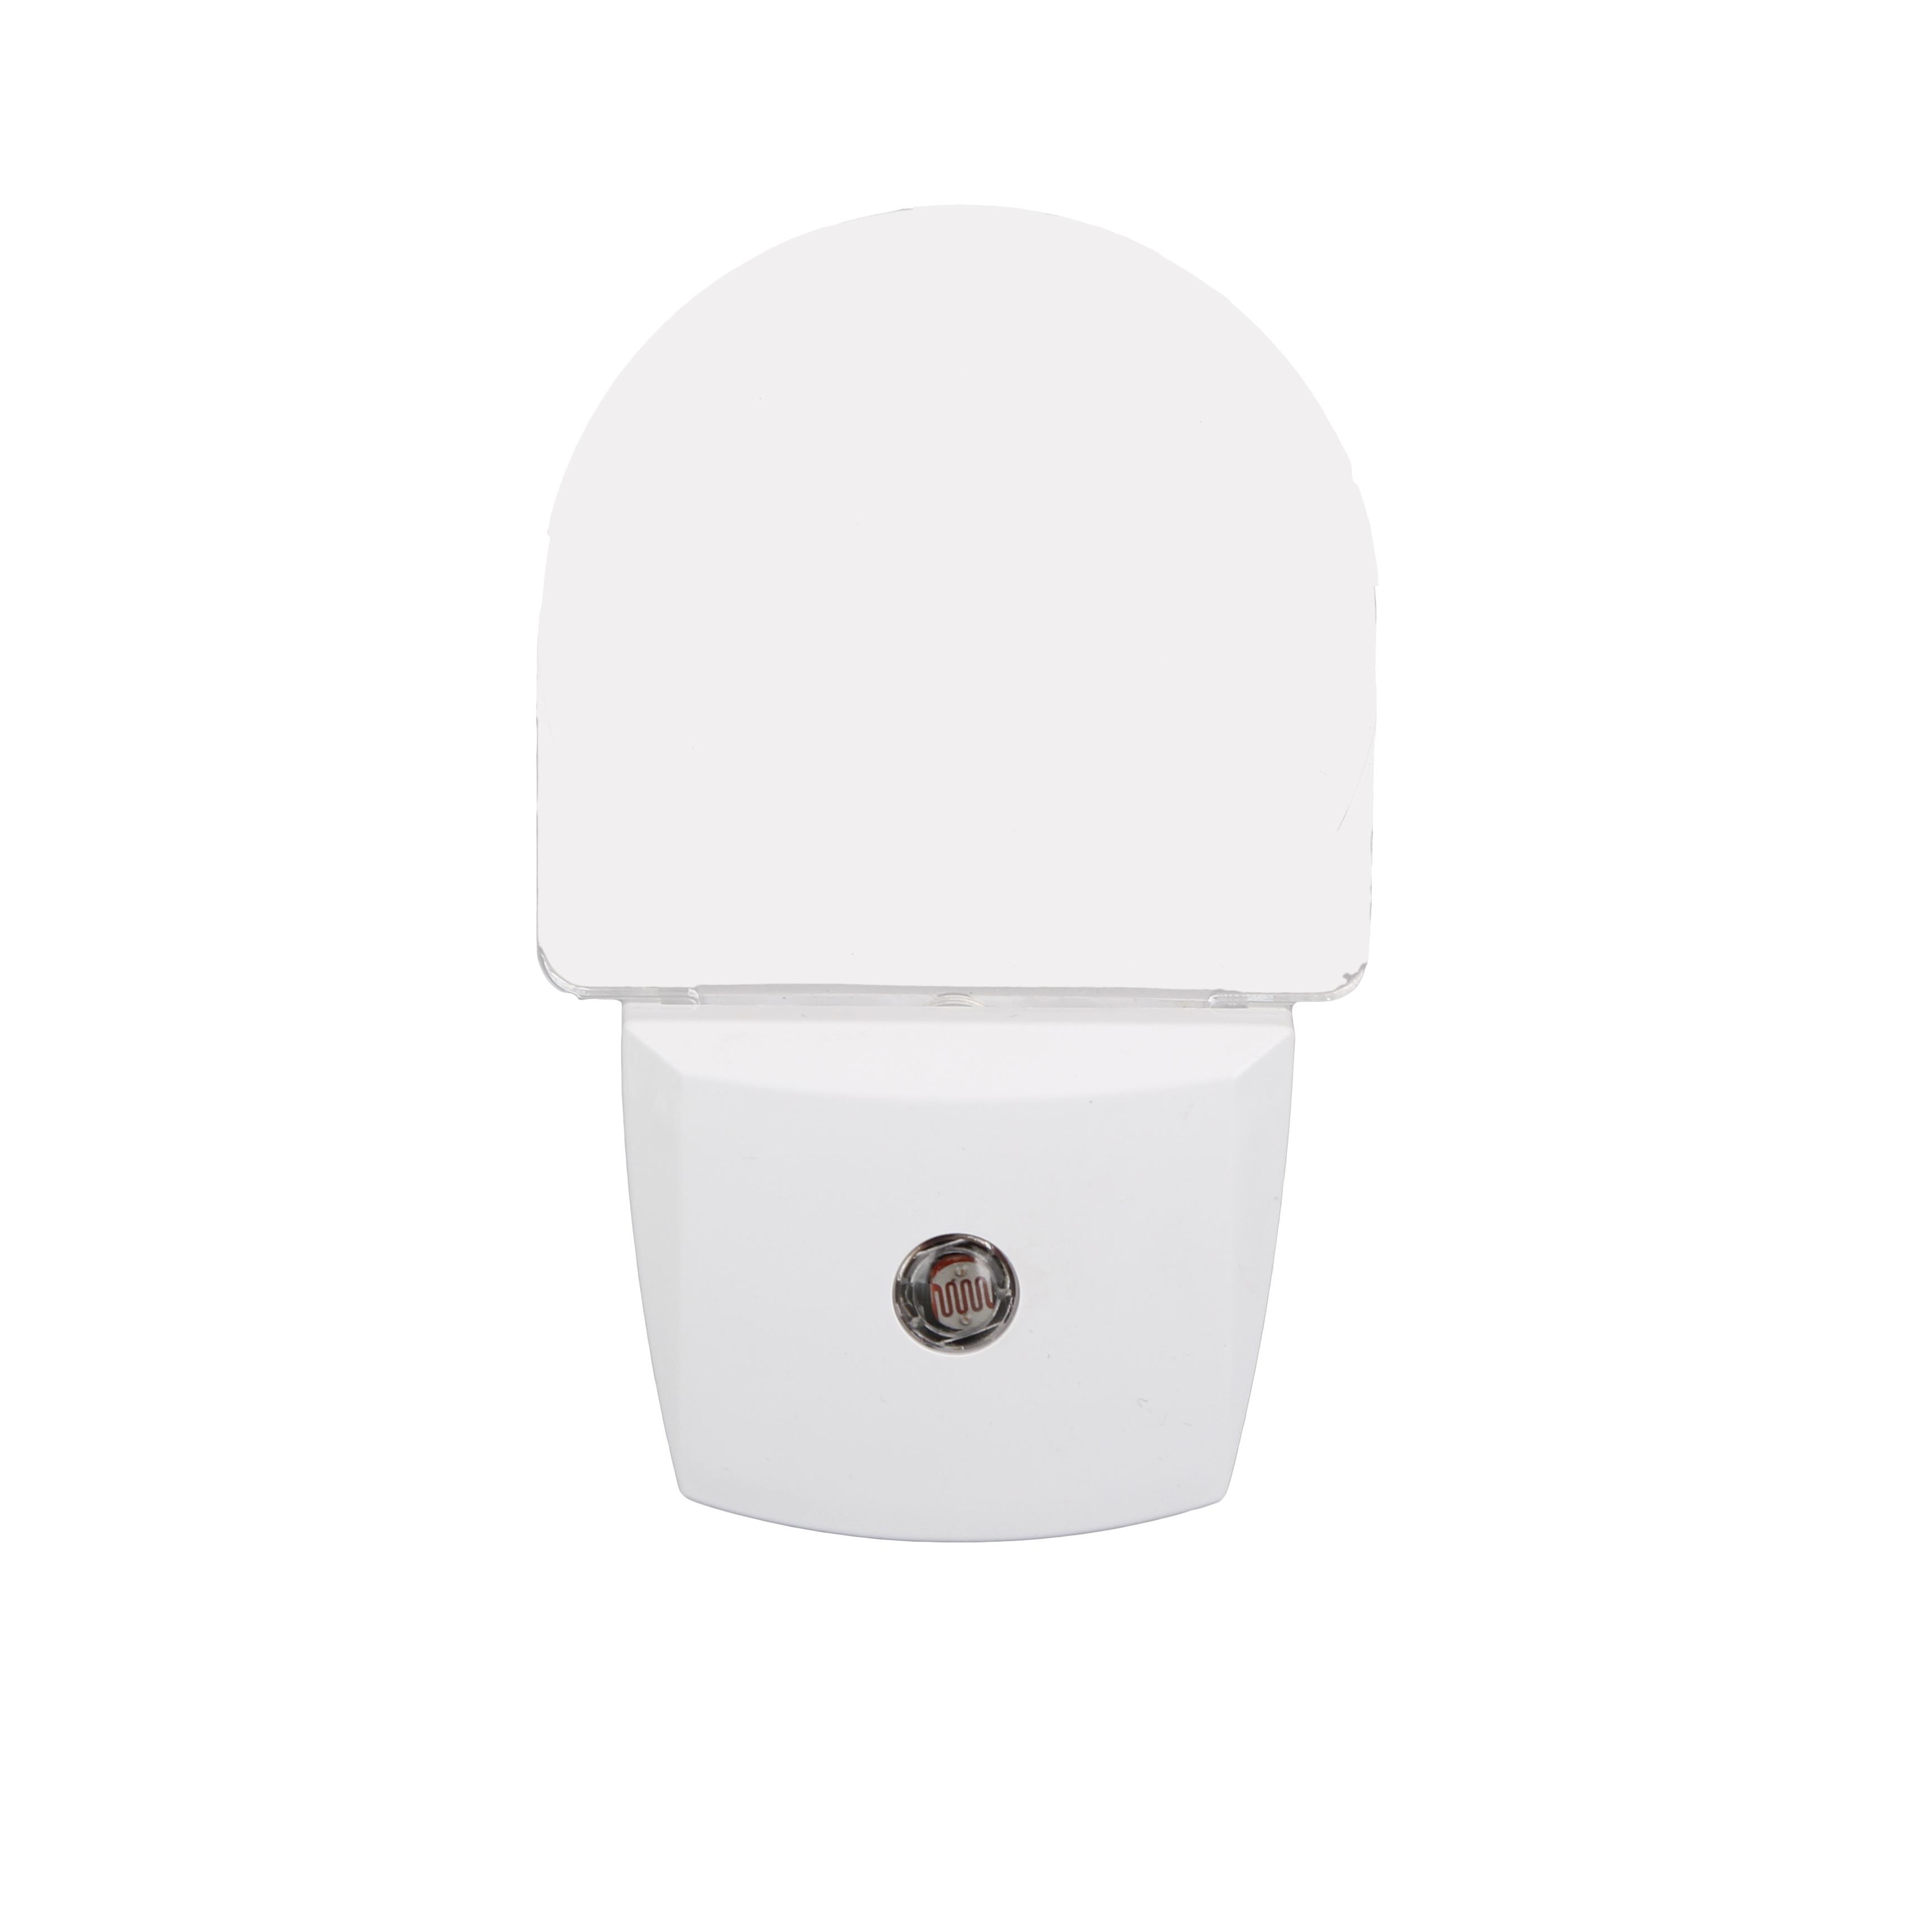 Multi Color Outside Light Photo Sensor 0.5W LED Power Low Electricity Consumption